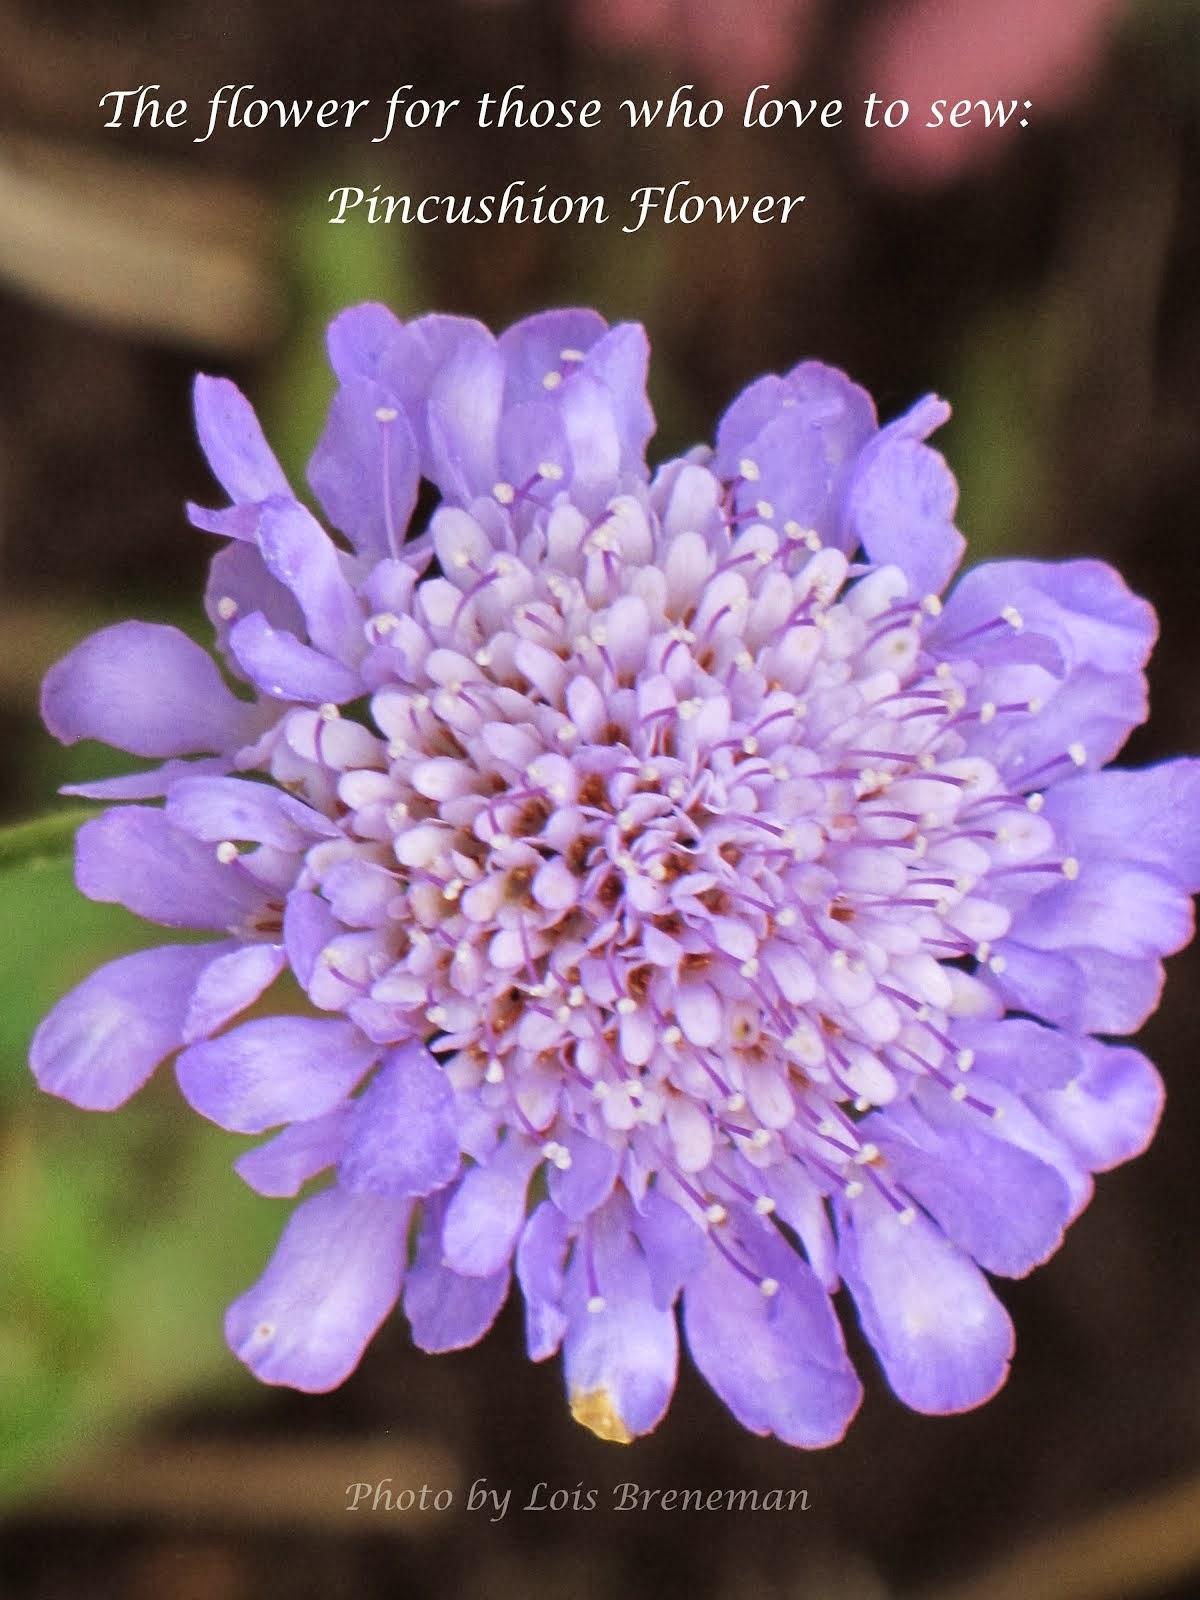 Pincushiopn Flower